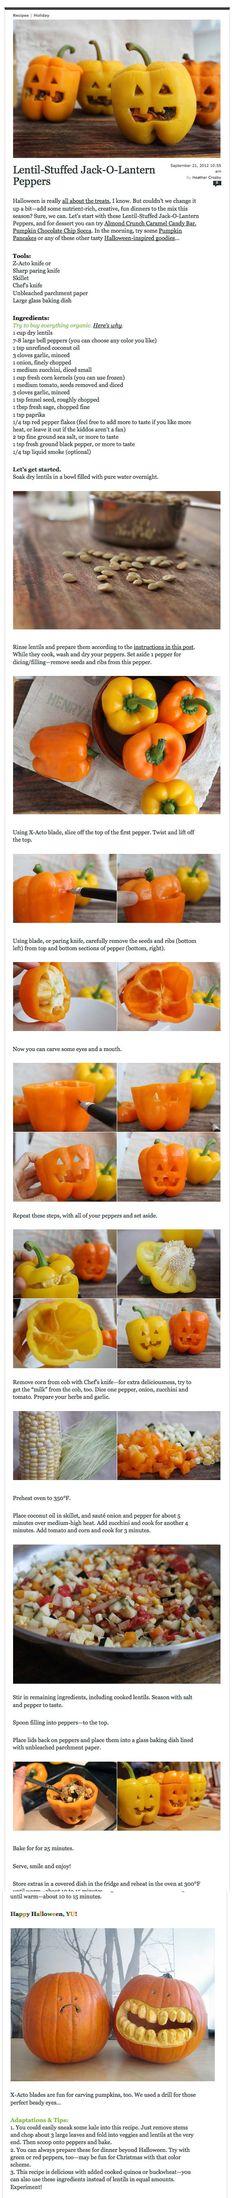 Stuffed Jack-O-Lantern Peppers. Happy Halloween!